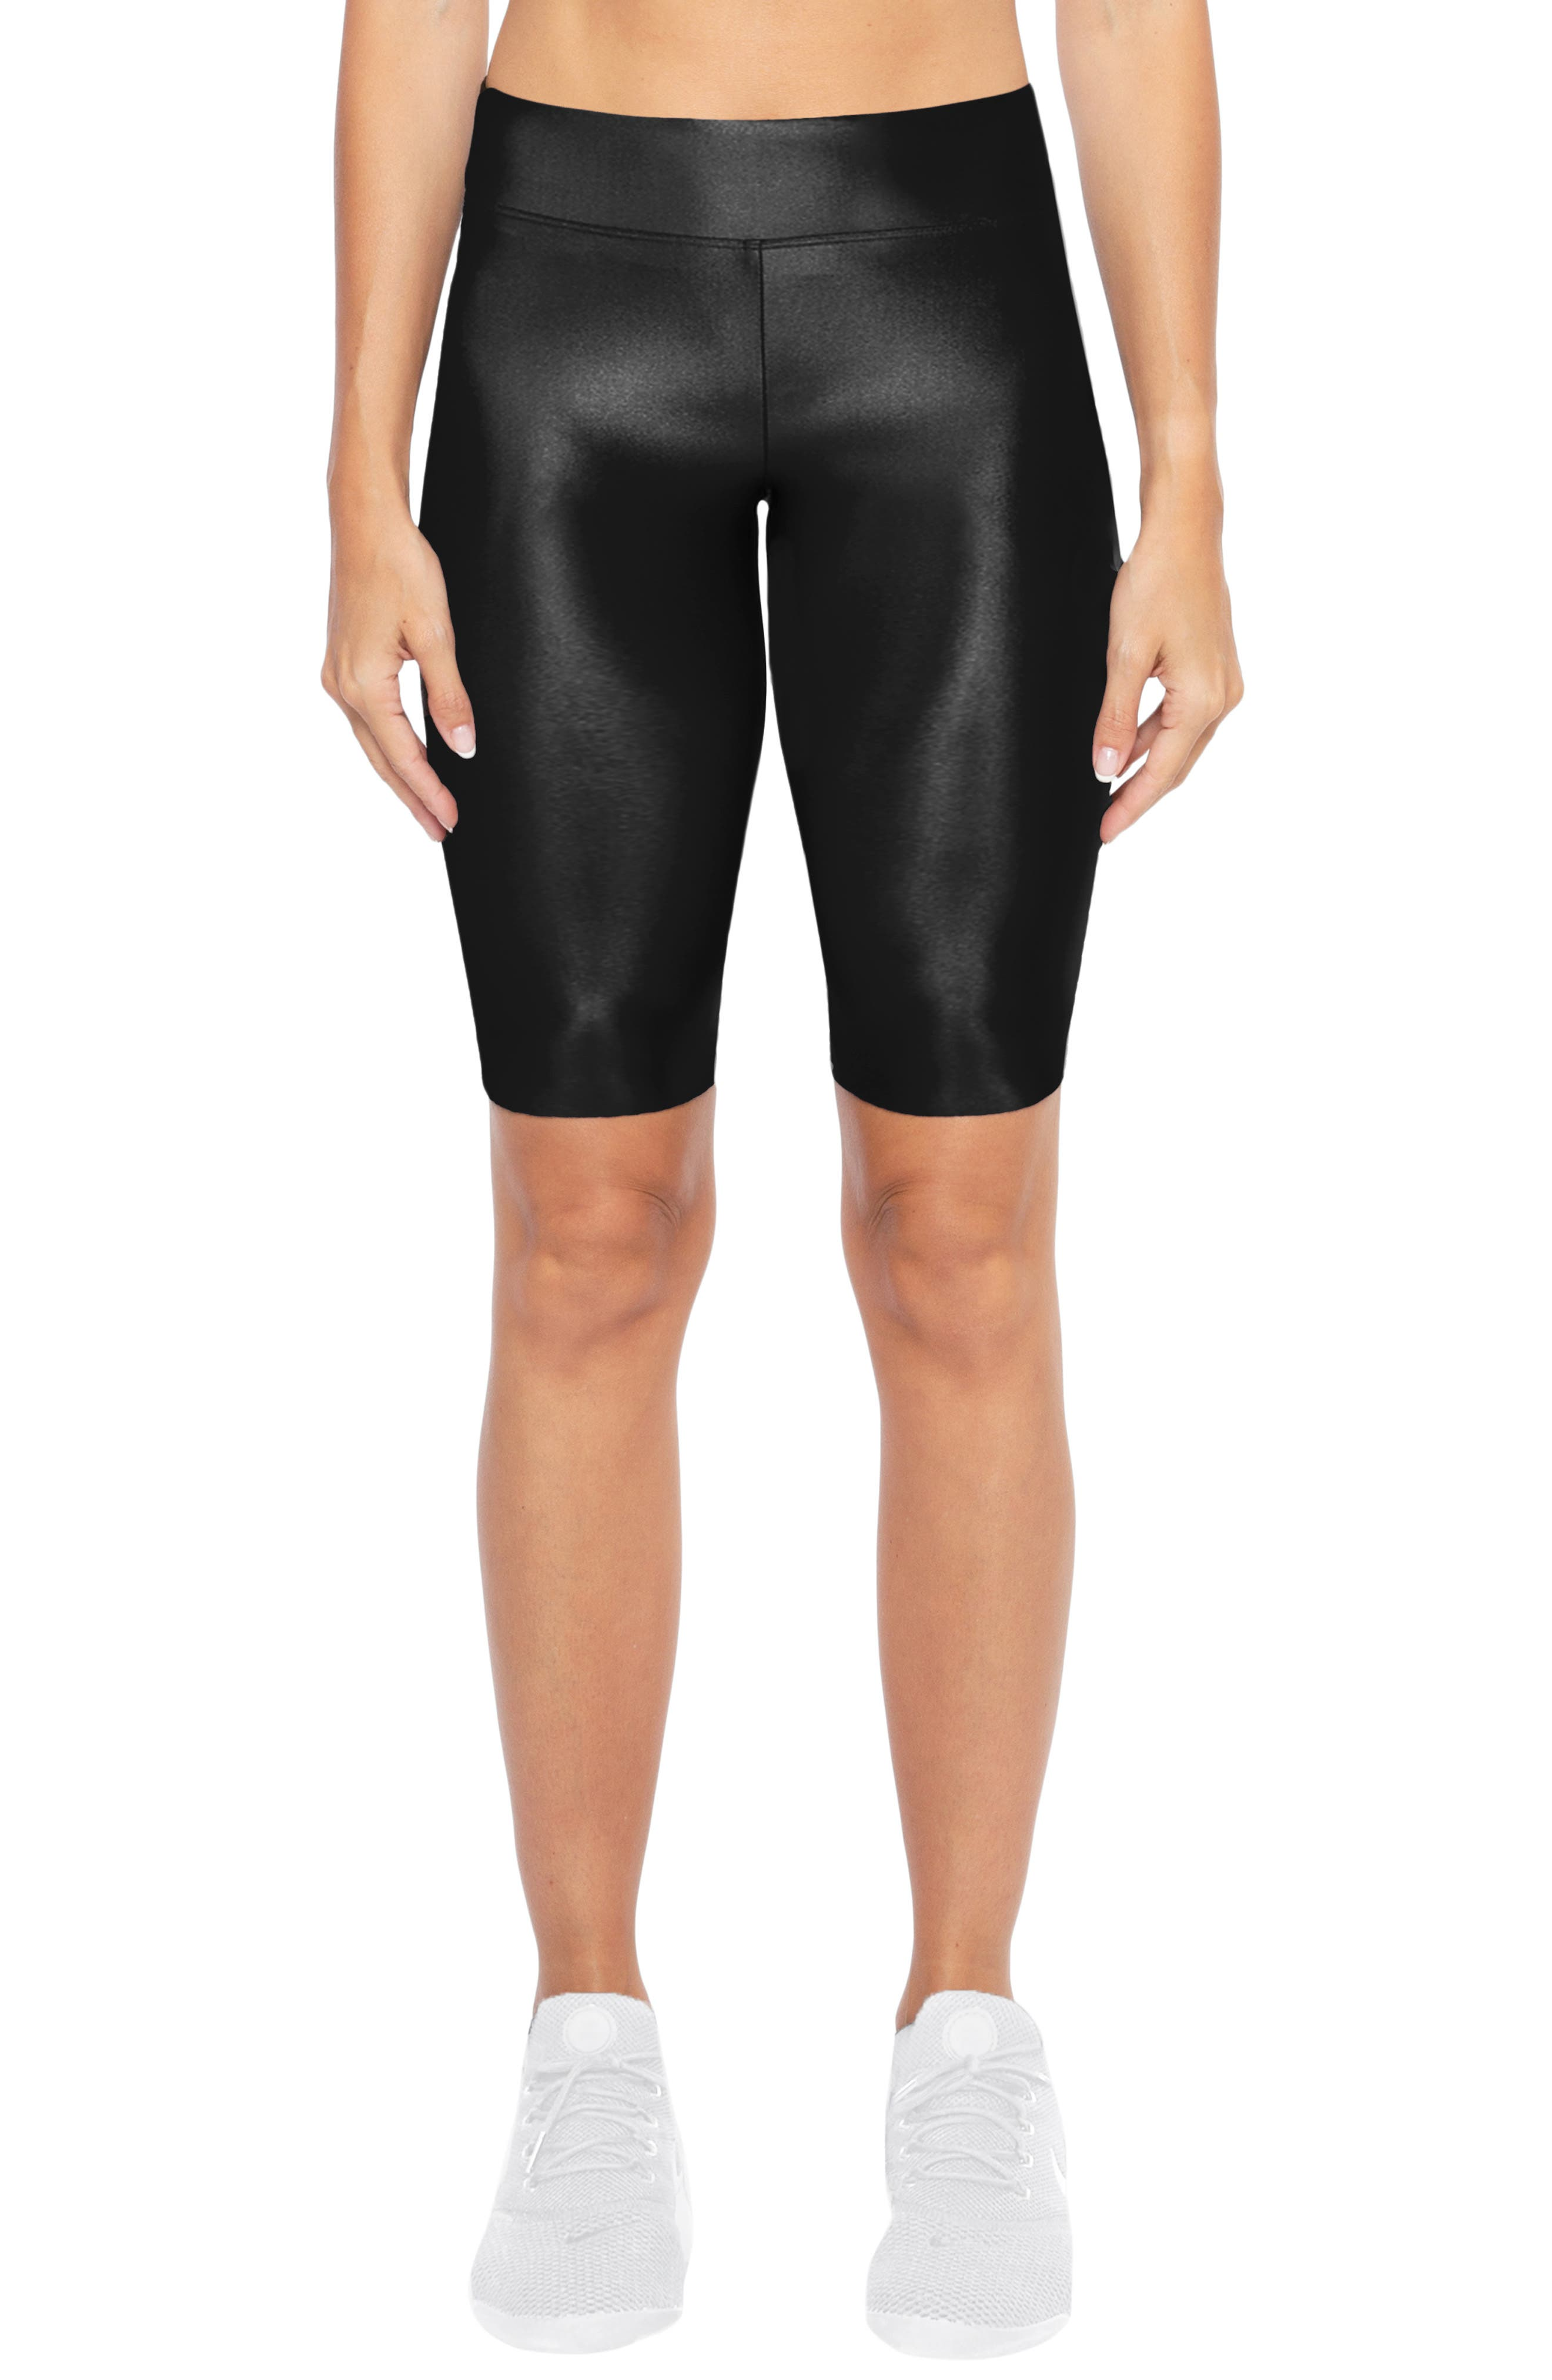 Densonic High Waist Bike Shorts,                         Main,                         color, BLACK